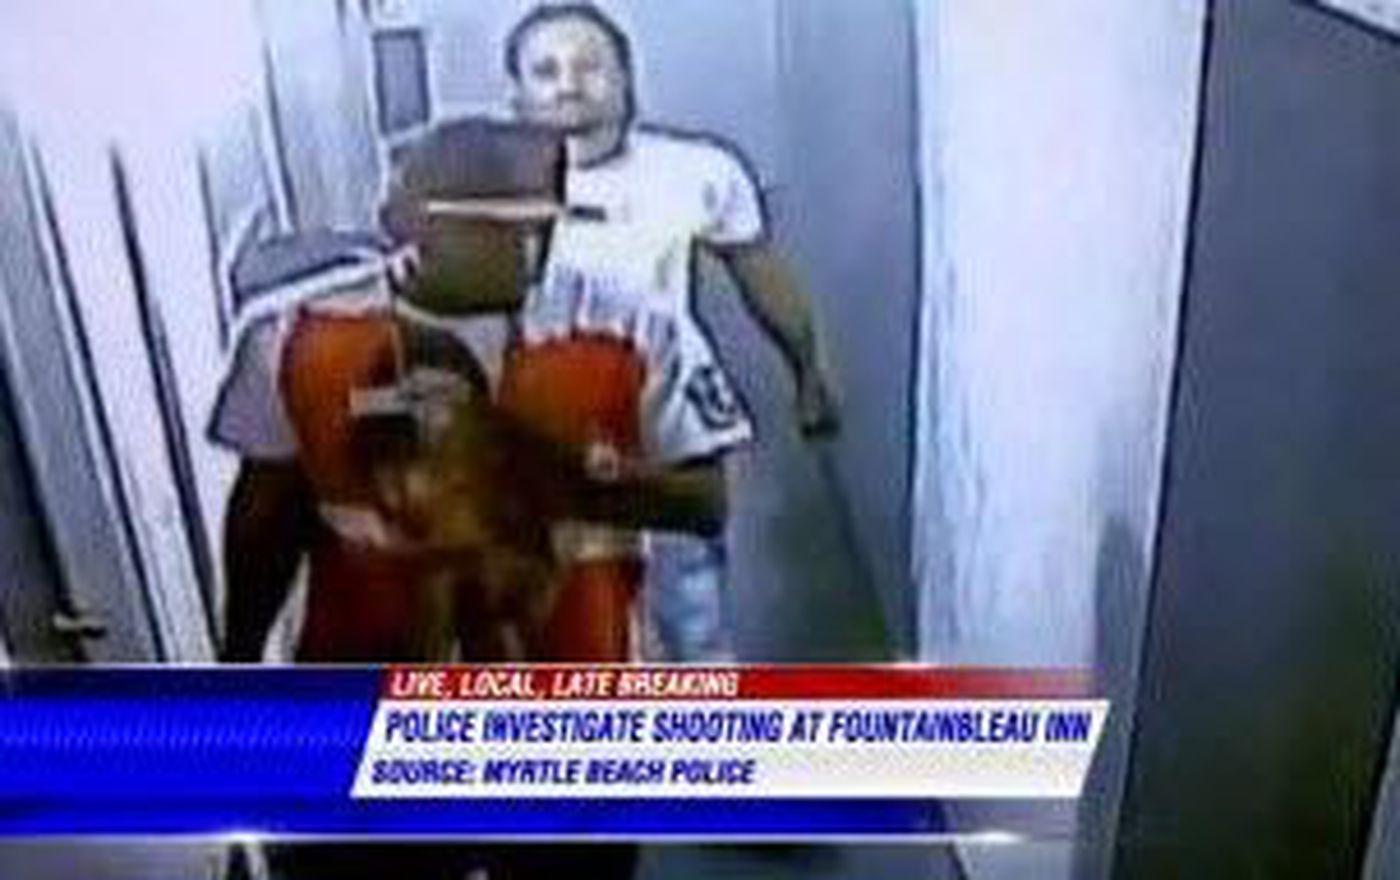 MBPD issues arrest warrant in Fountainbleau Inn shooting